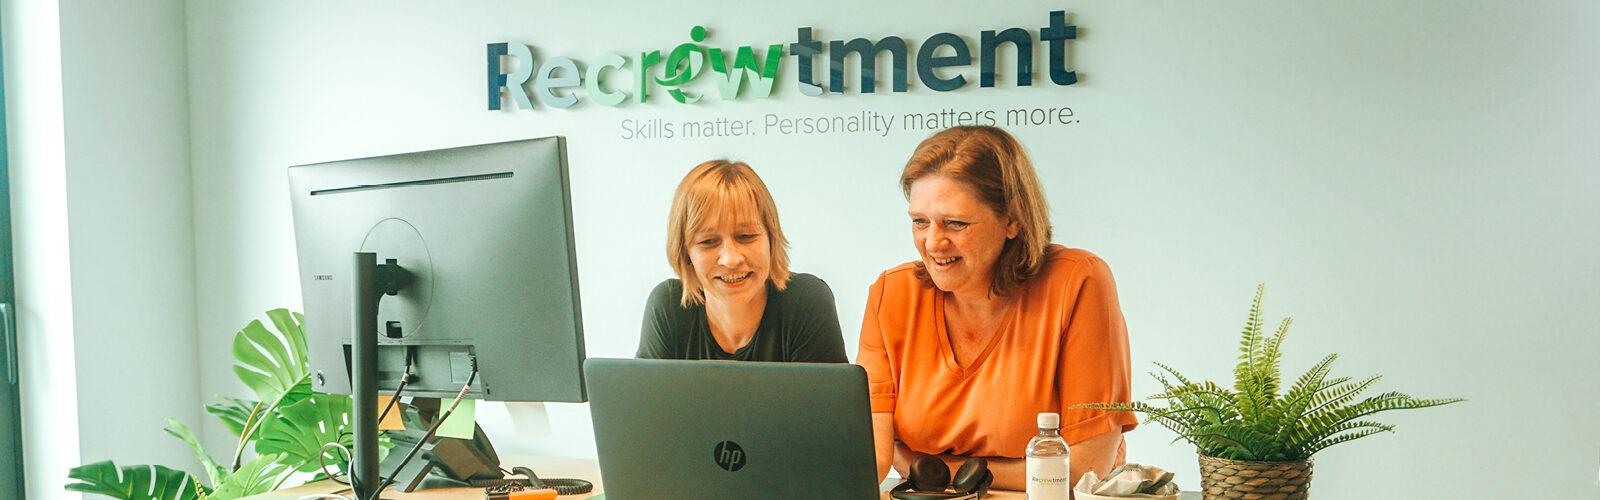 recrewtment-team-rekrutering-selectie-rekruteringspartner-hr-niches-specialisaties